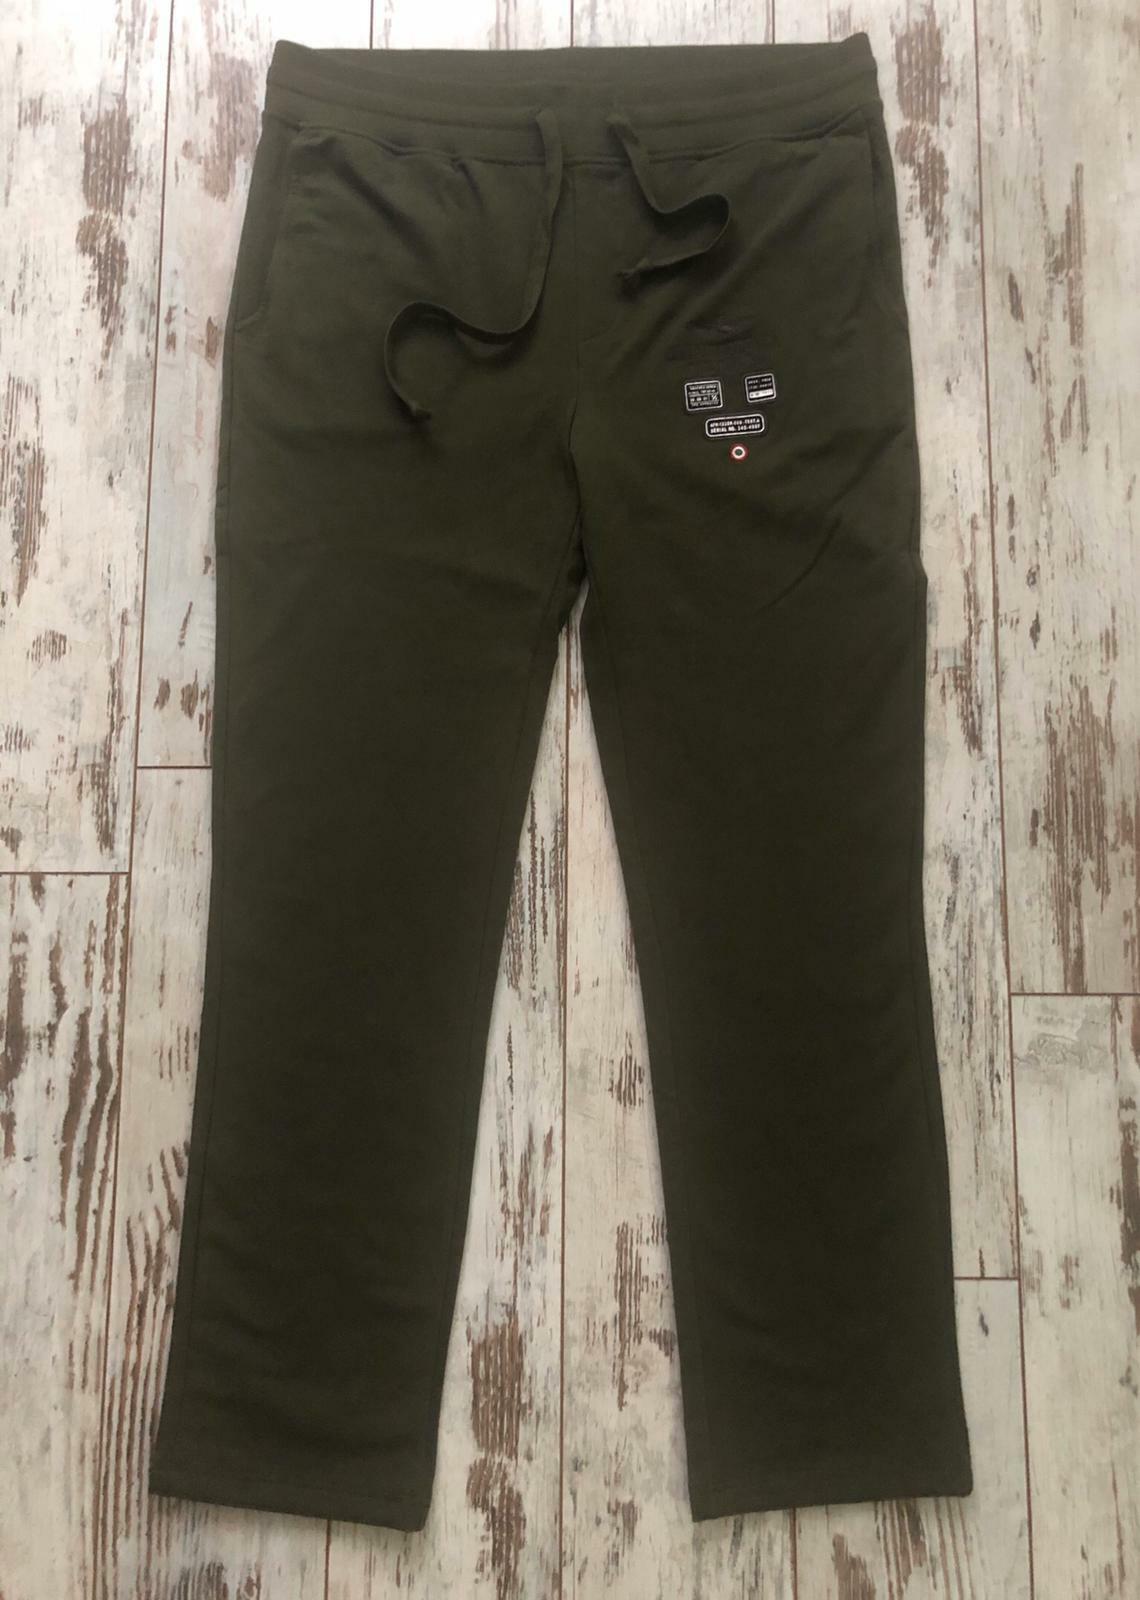 Authentic Aeronautica Militare Khaki Green Logo Embroidery Fleece Sweatpants